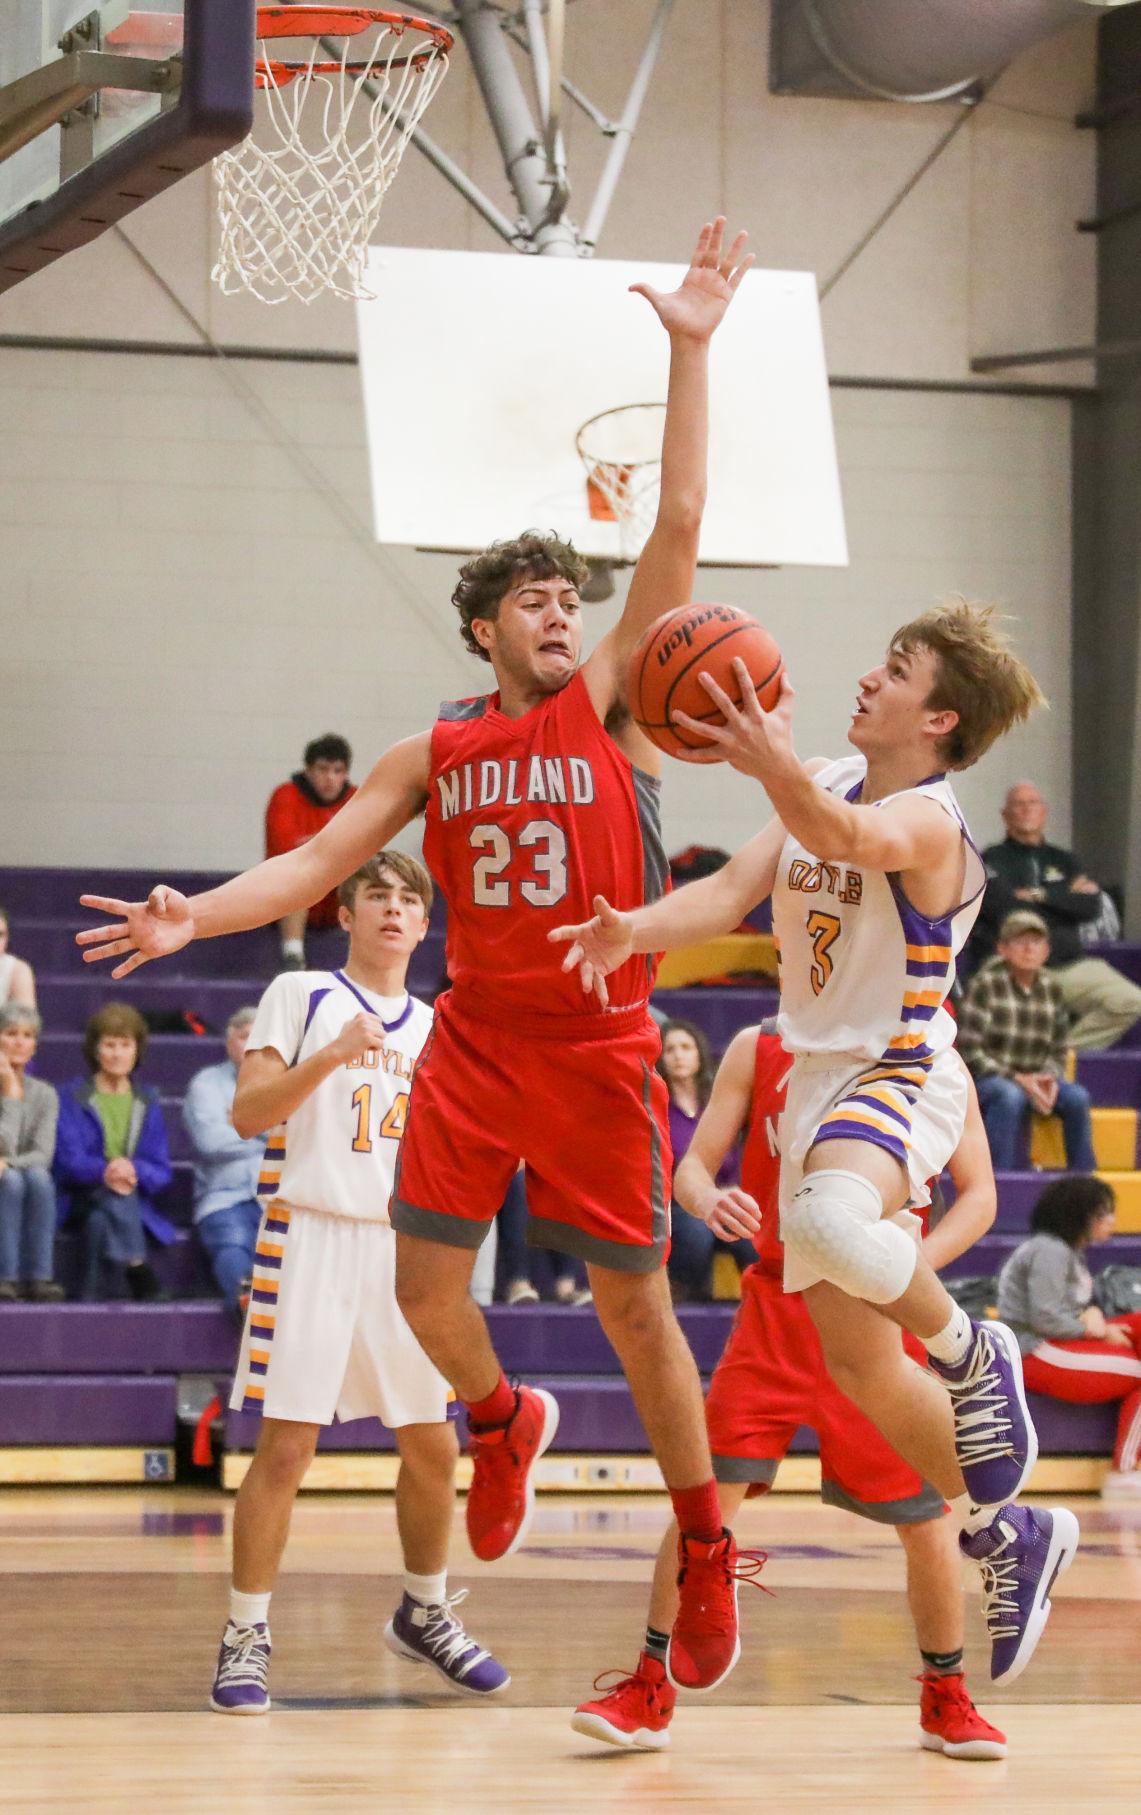 Midland at Doyle boys basketball Braden Keen Chris Breaux